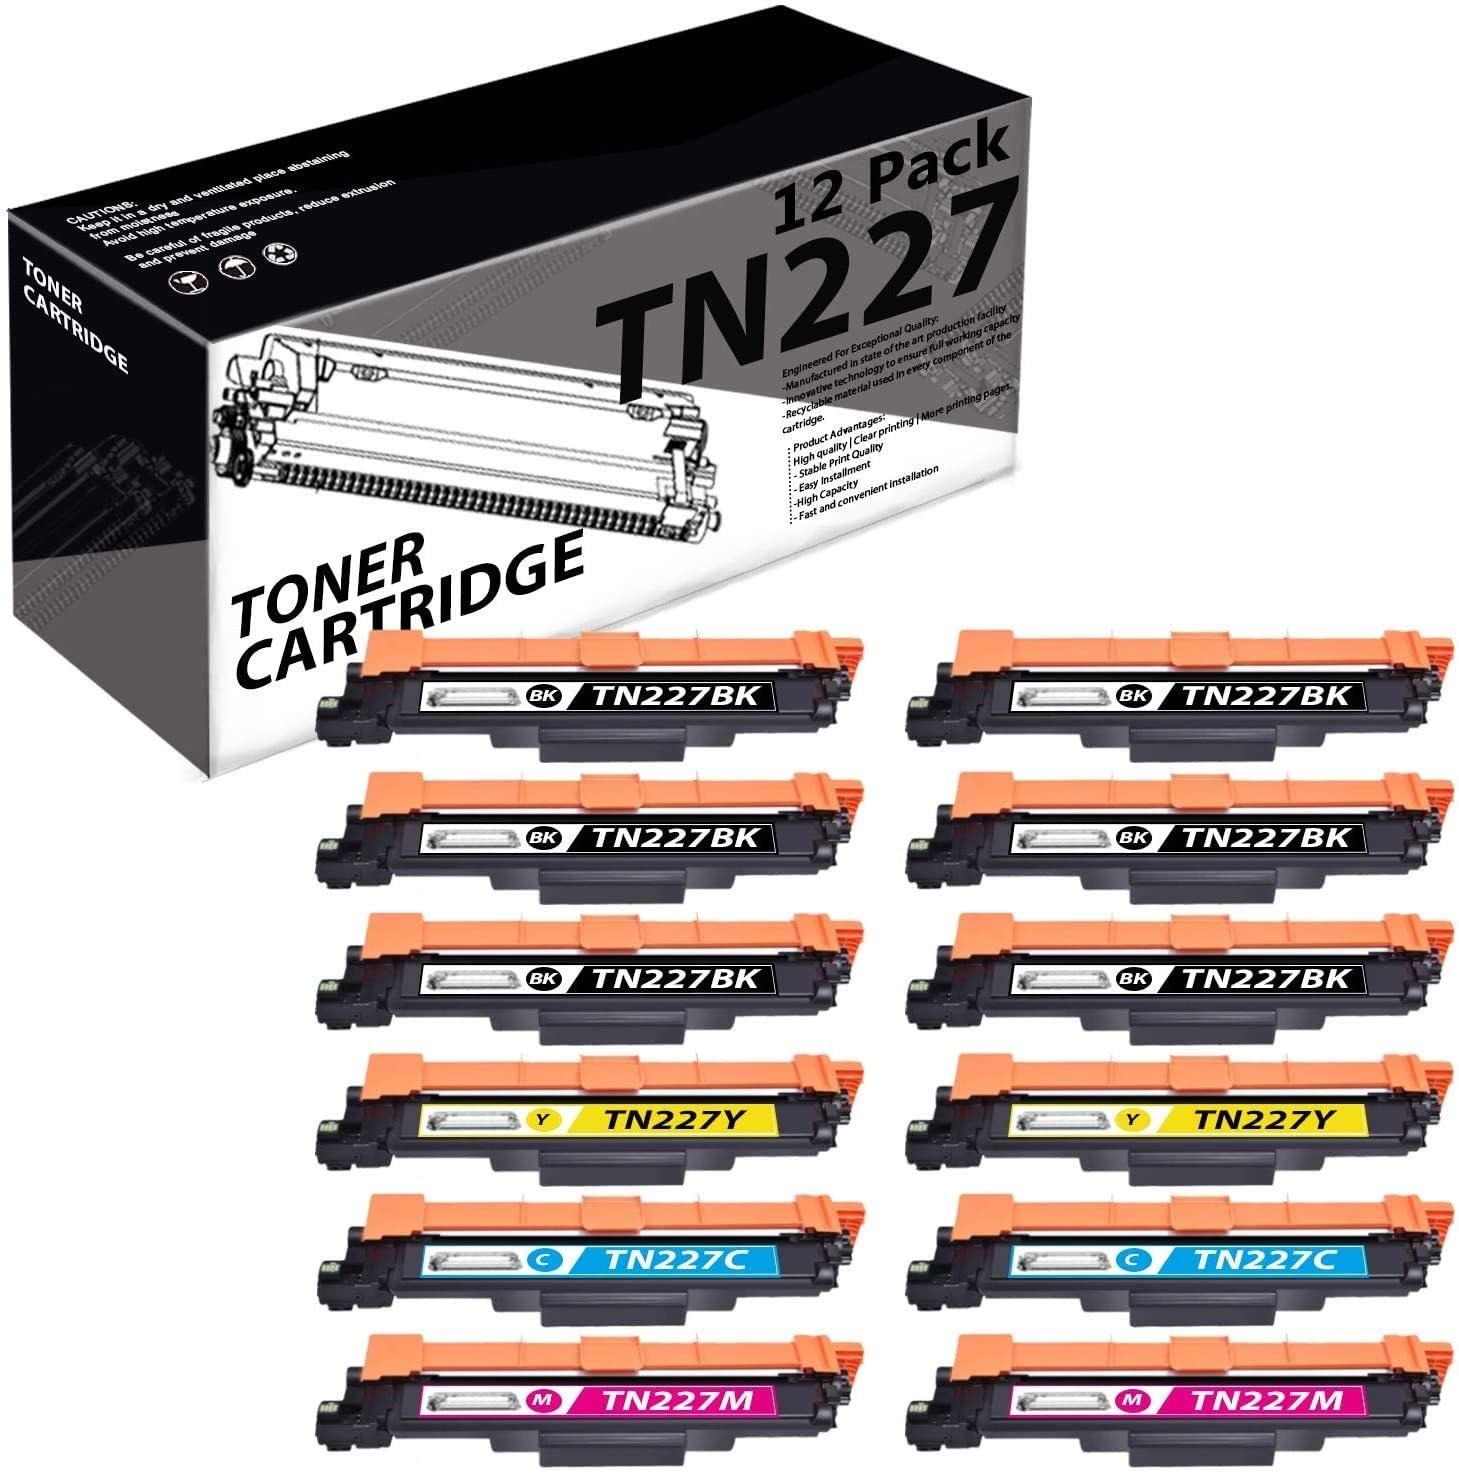 TN227(12 Pack-6K+2C+2M+2Y) Compatible Toner Cartridge Replacement for Brother HL-3210CW 3230CDW 3270CDW DCP-L3510CDW L3550CDW MFC-L3770CDW L3710CW L3750CDW Printers.